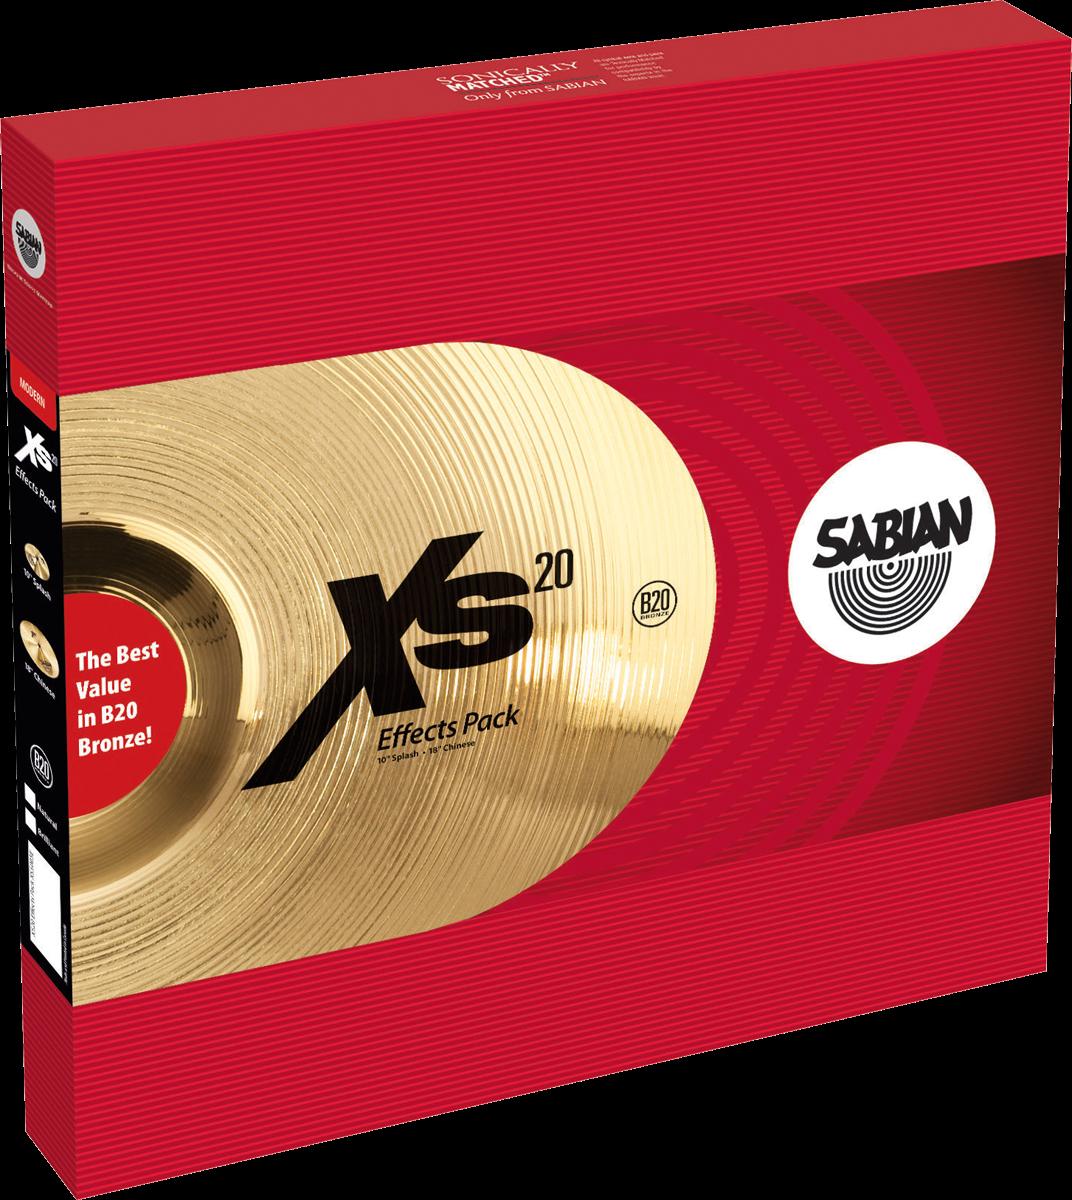 "Sabian Cymbaal XS20 Harmonische Pack Effects 10""-18"""